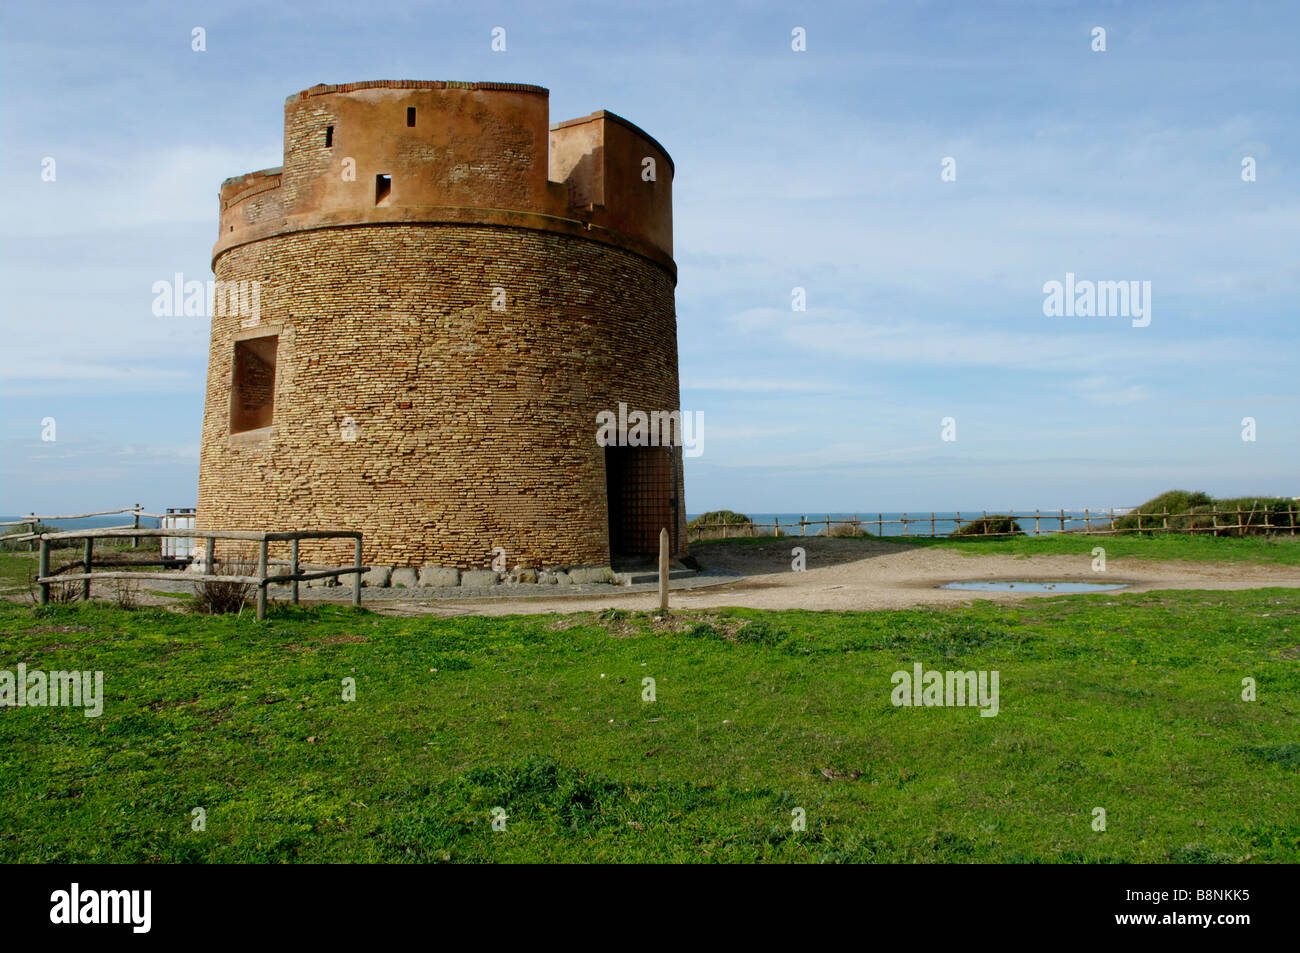 Tor Caldara tower, near Anzio - Stock Image